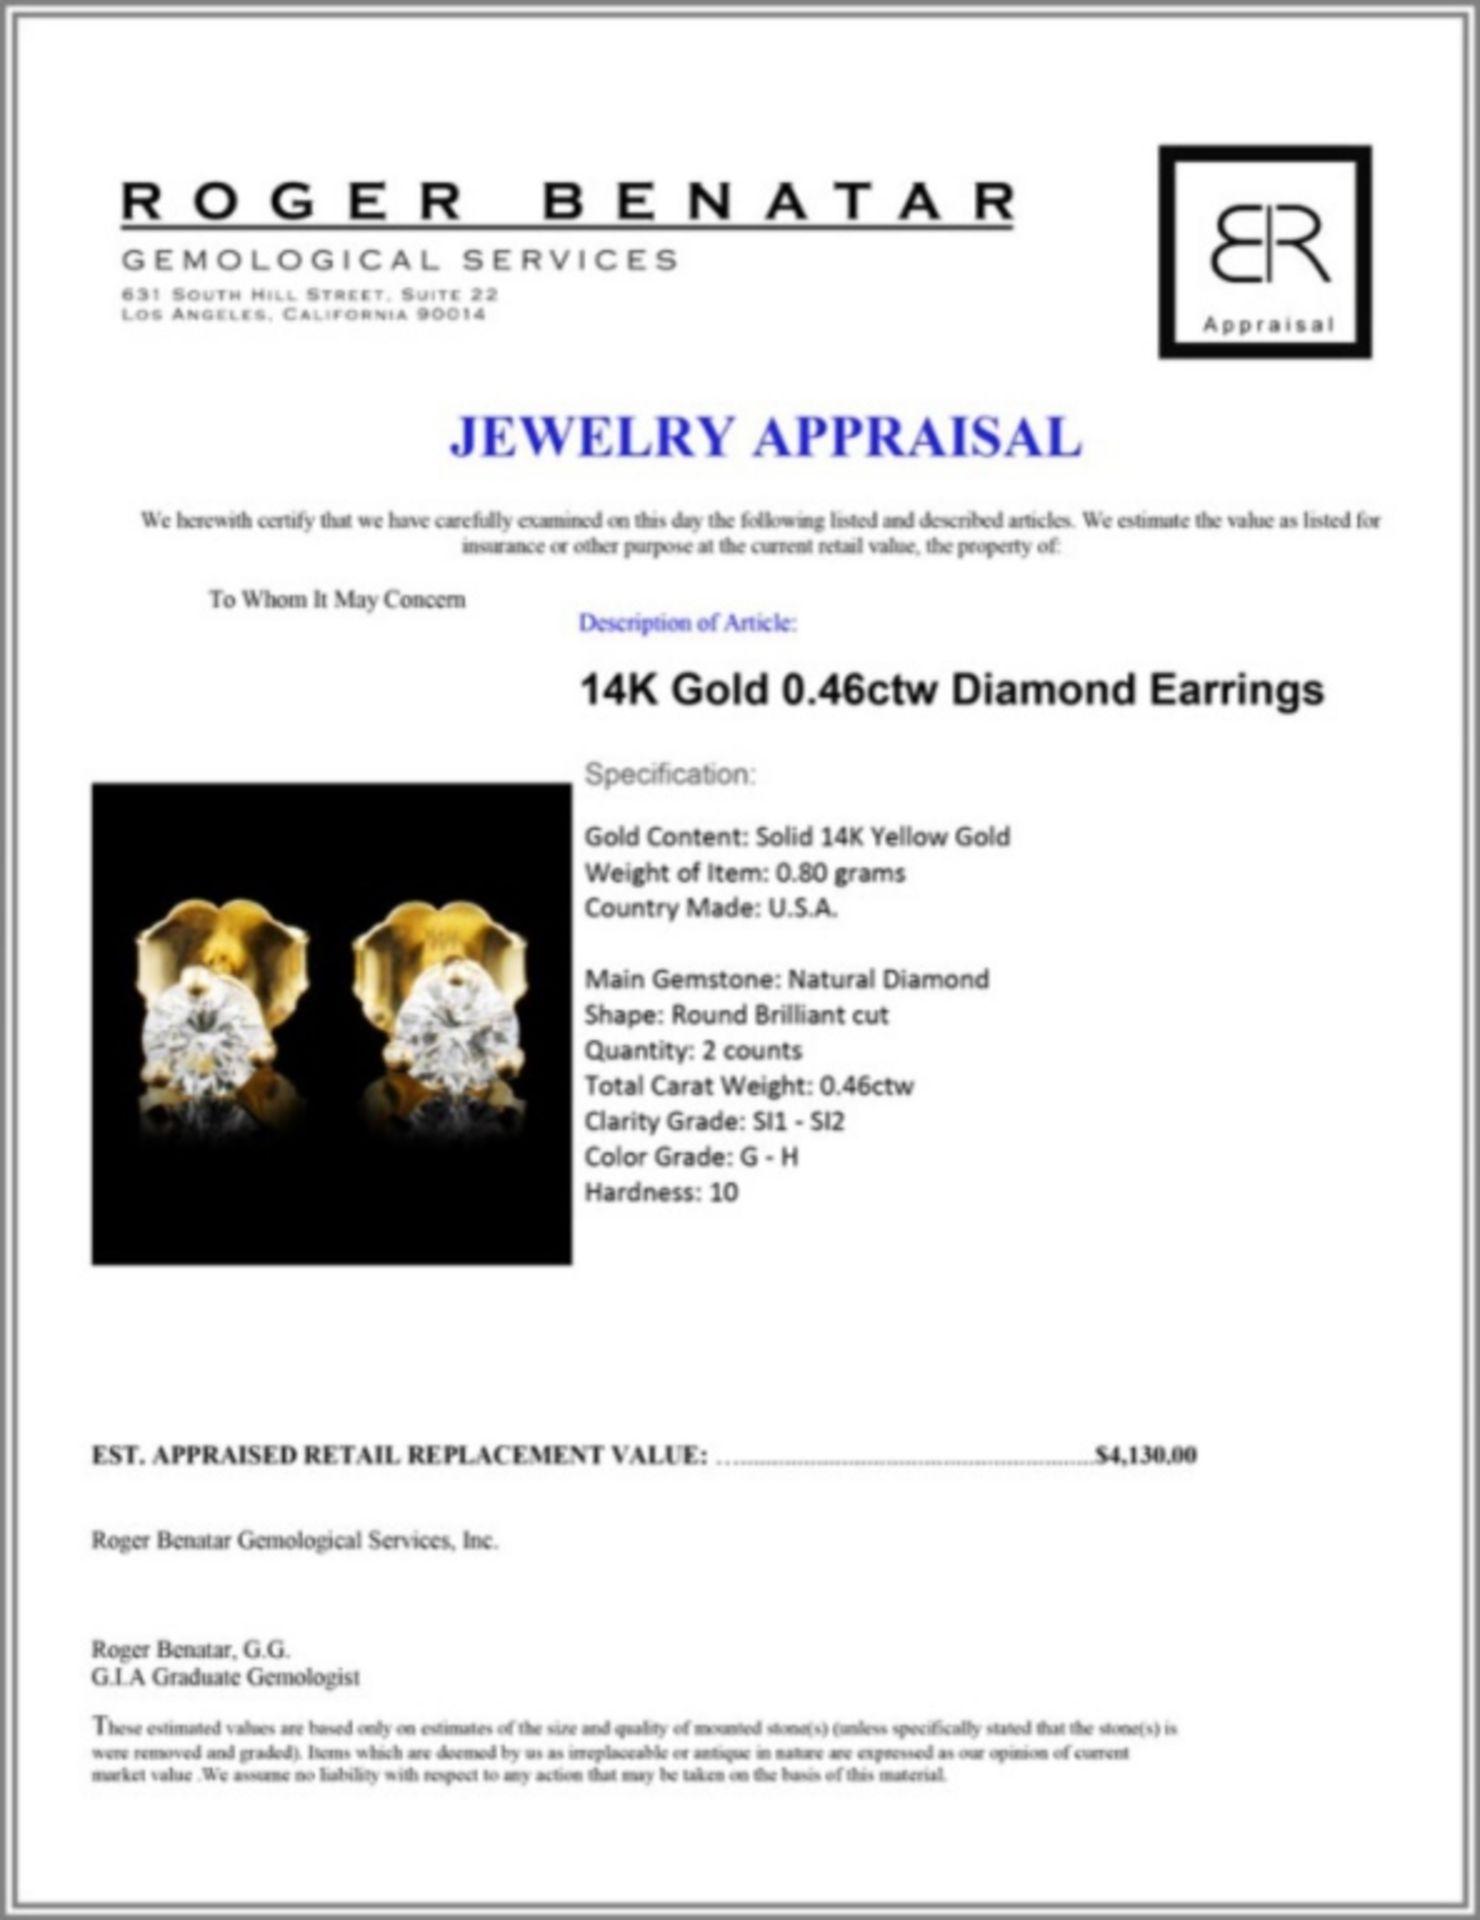 14K Gold 0.46ctw Diamond Earrings - Image 3 of 3